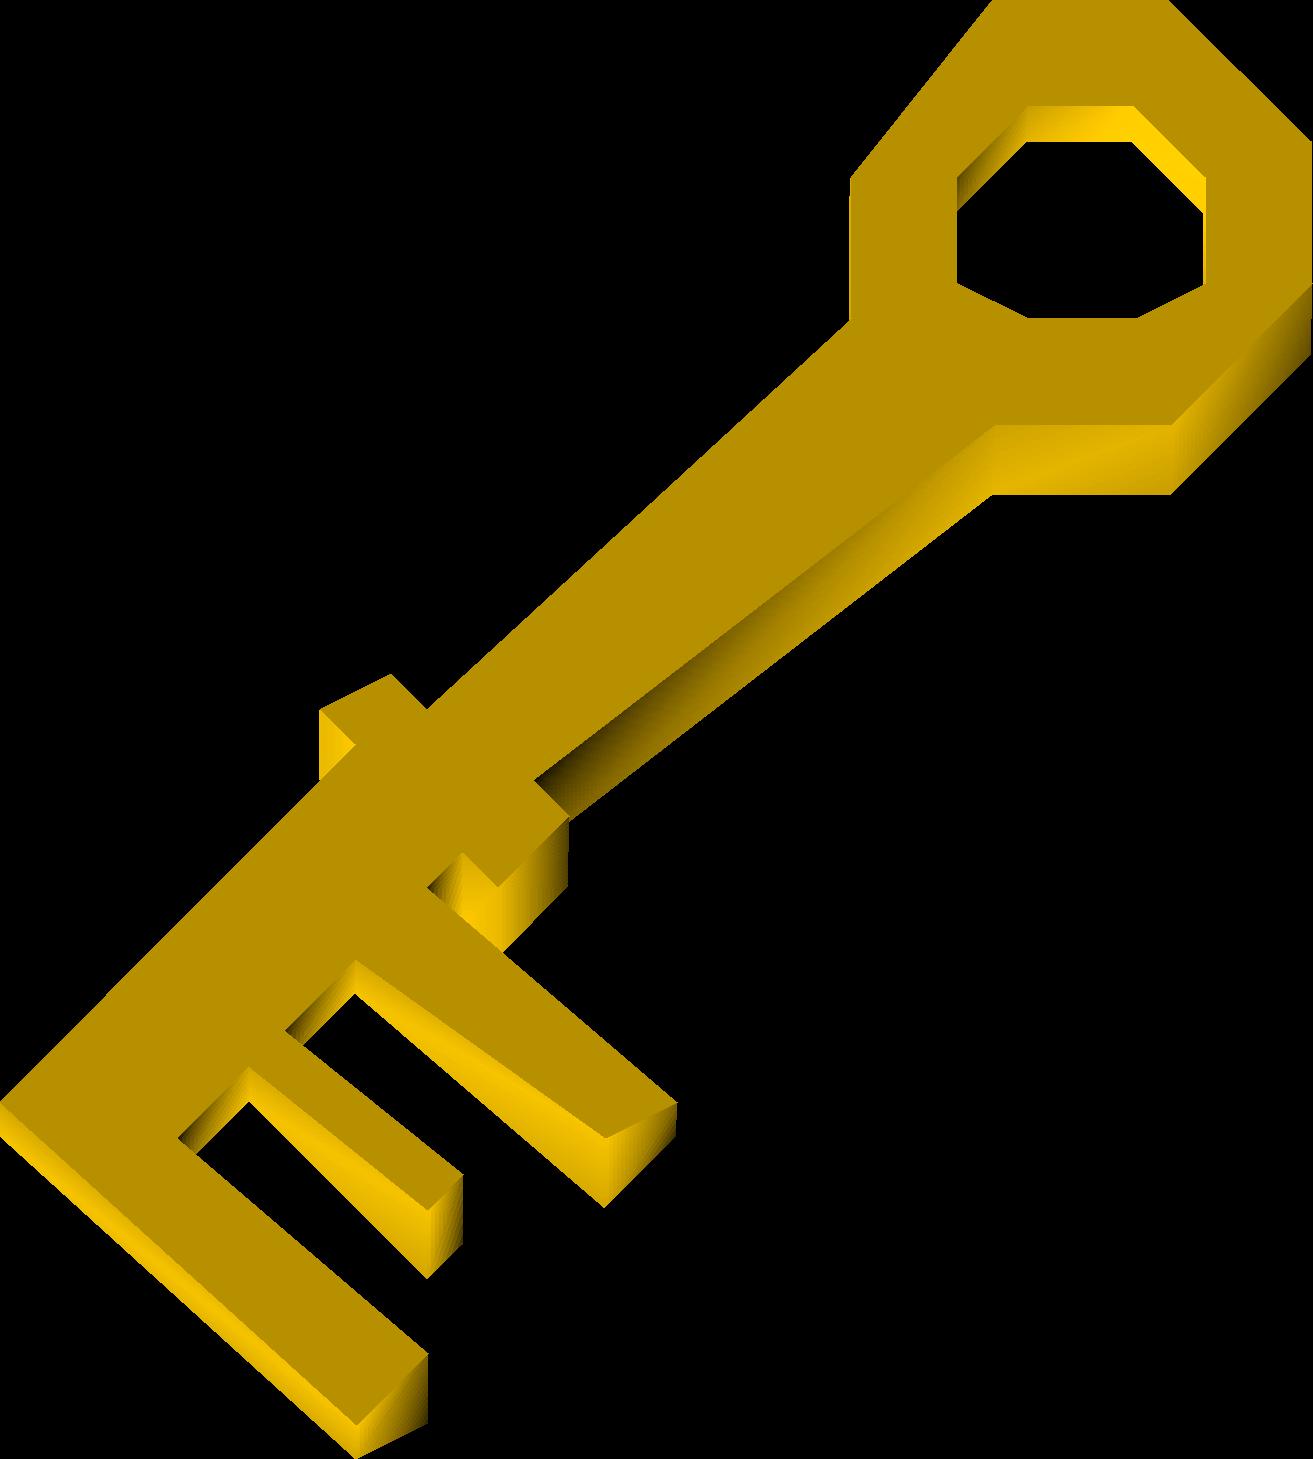 Keys old school runescape. Key clipart small key